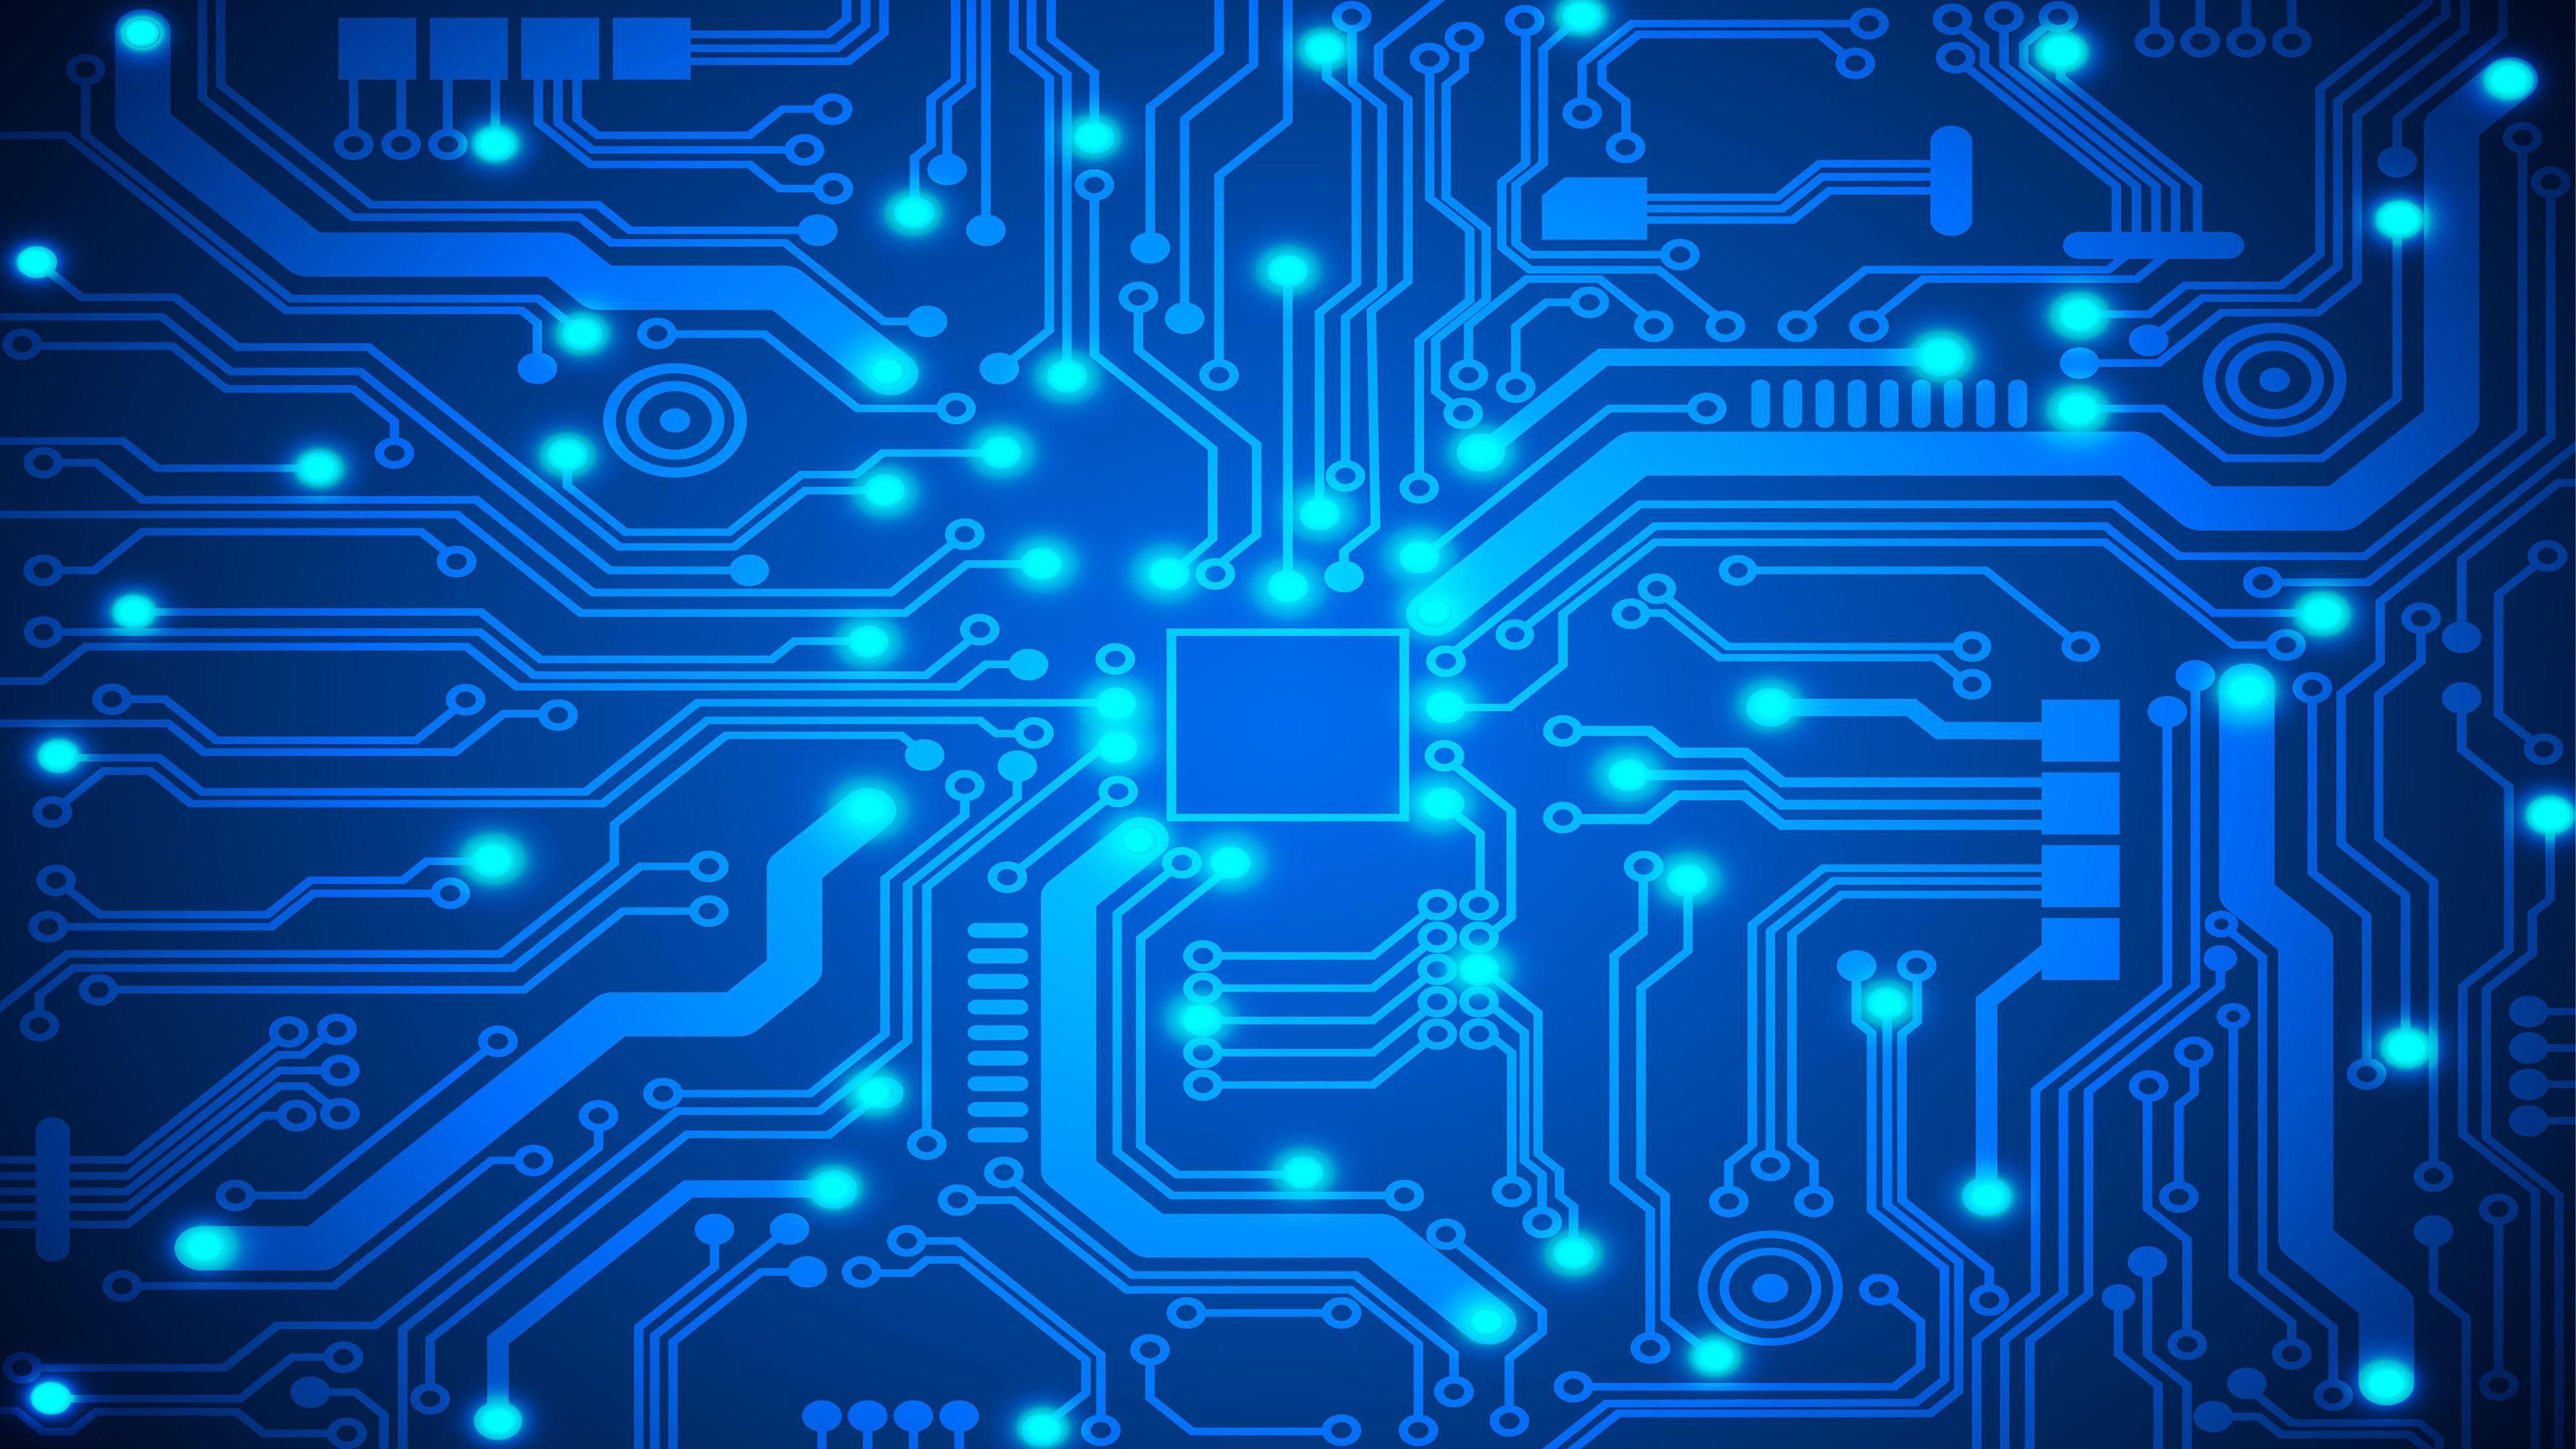 Circuit board wallpapers top free circuit board - Circuit board wallpaper android ...